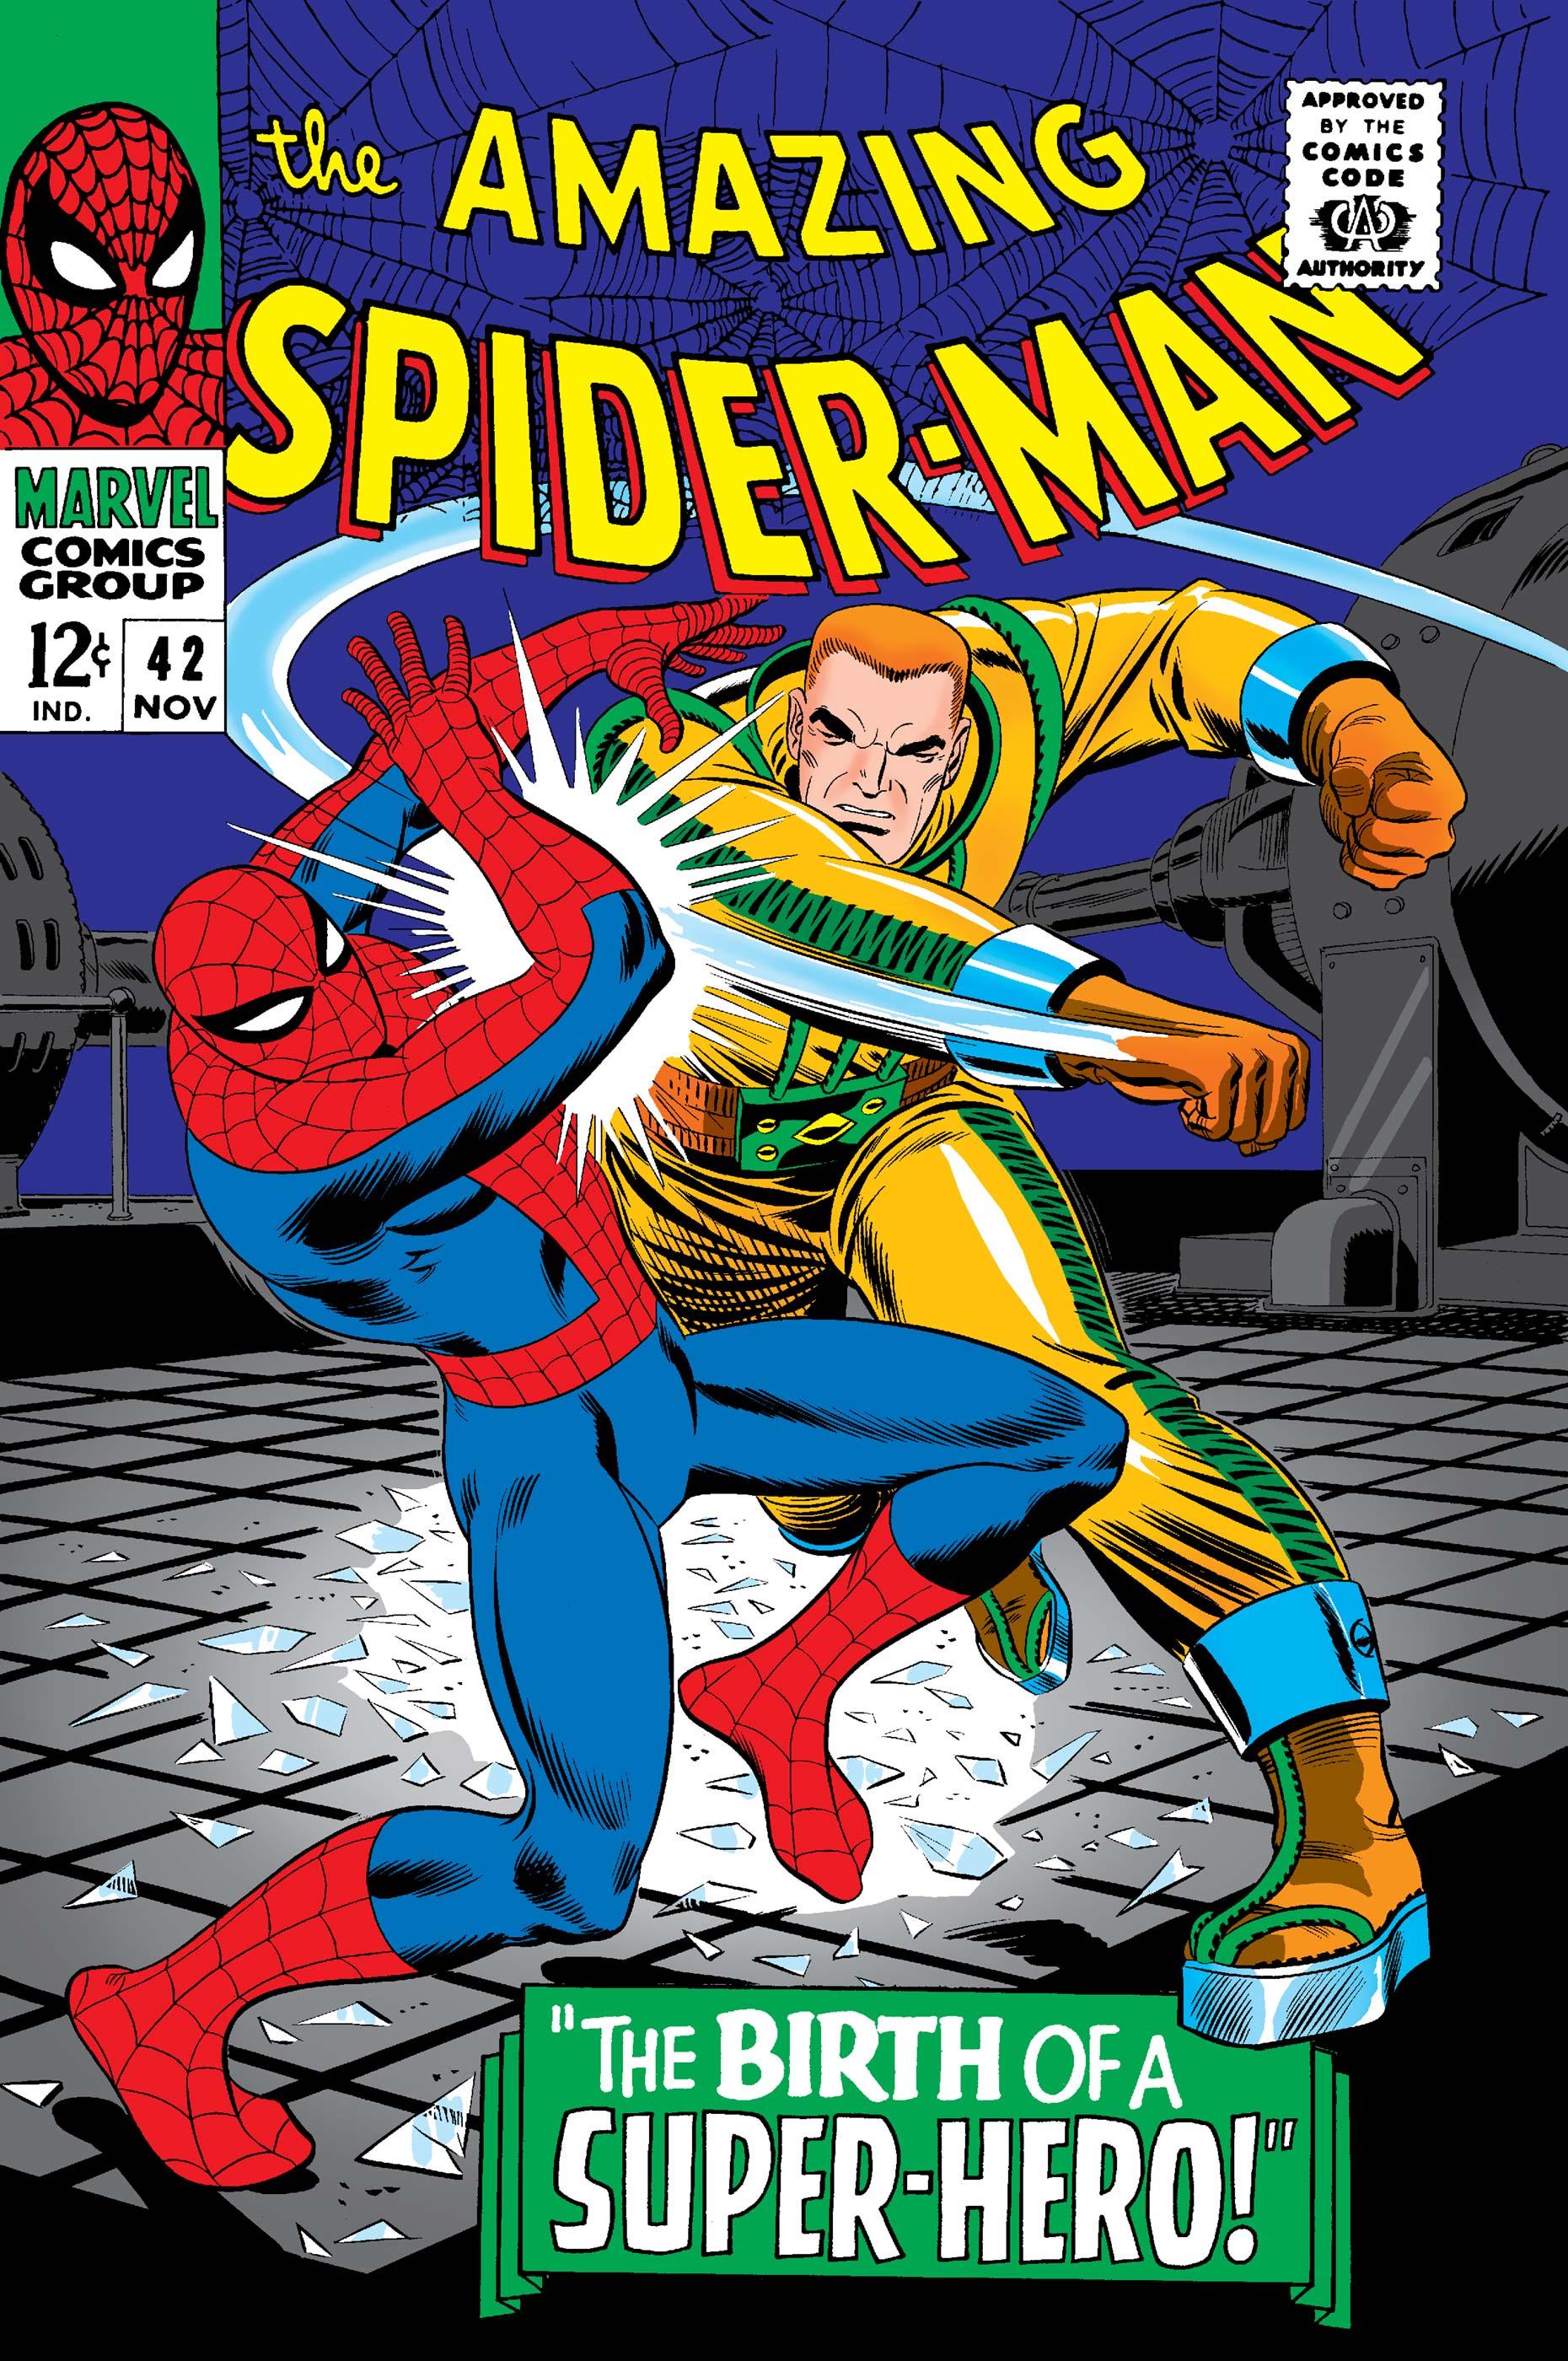 The Amazing Spider-Man (1963) #42